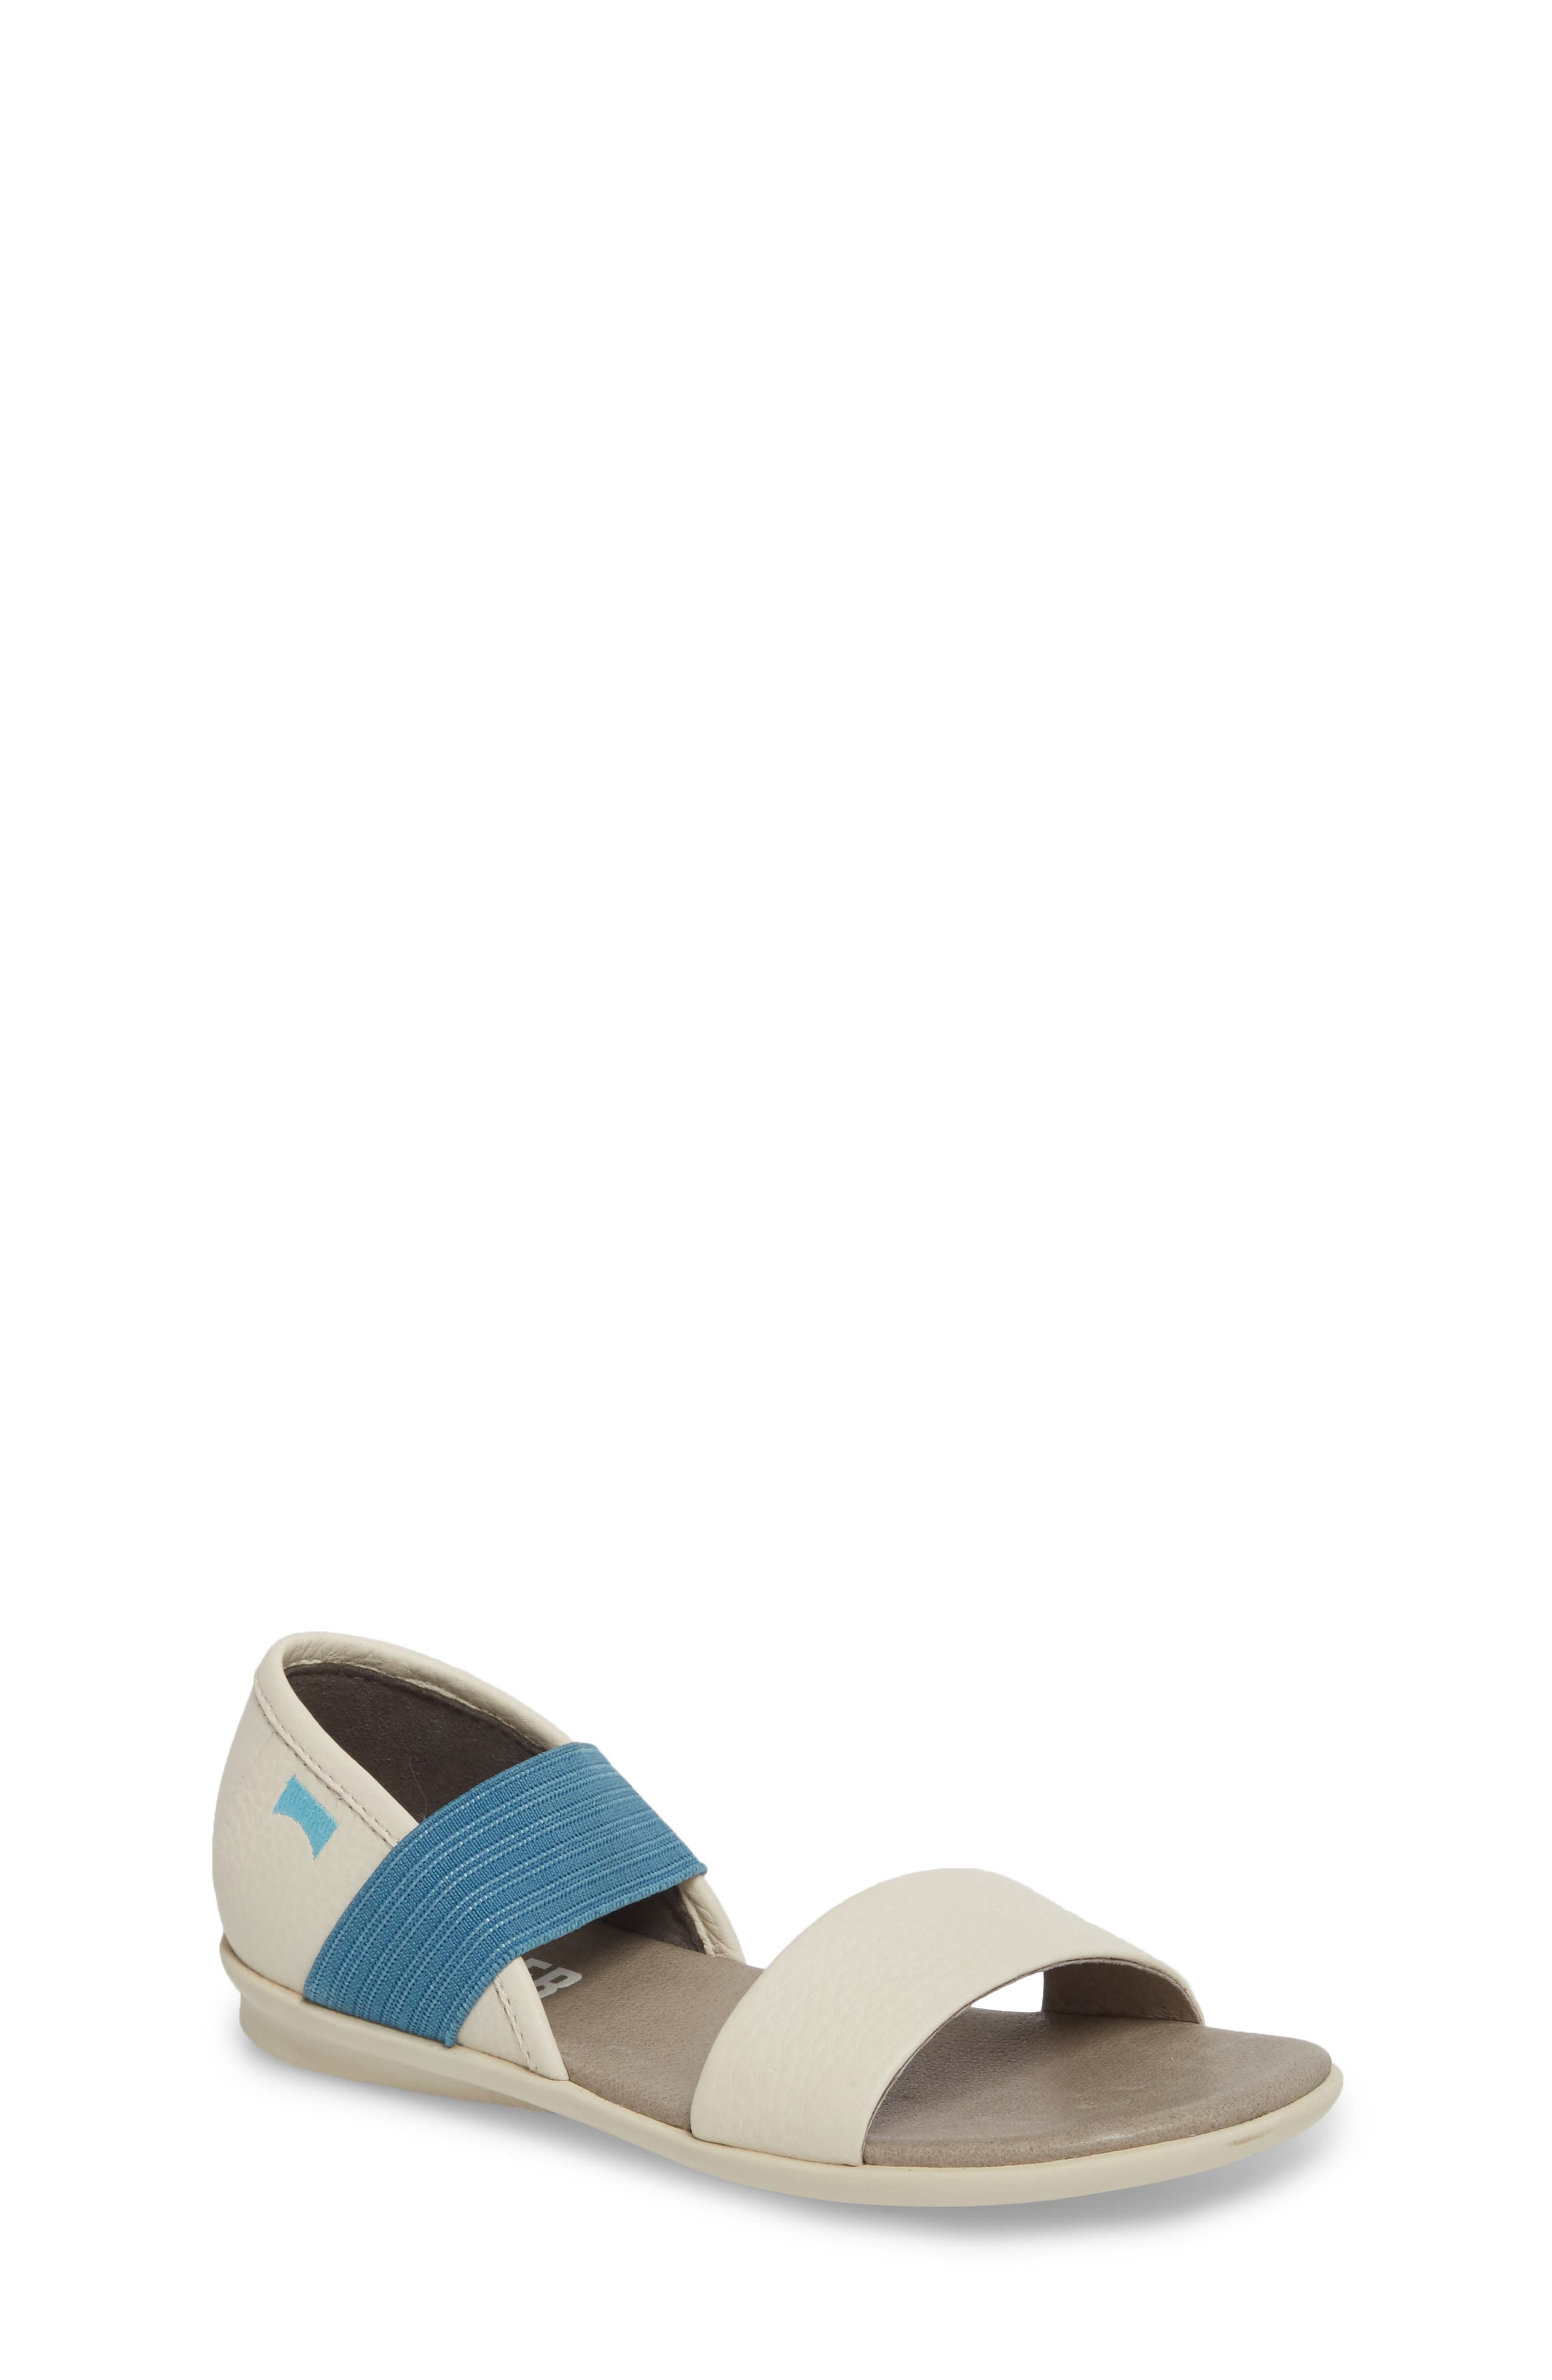 Right Sandal,                         Main,                         color, WHITE